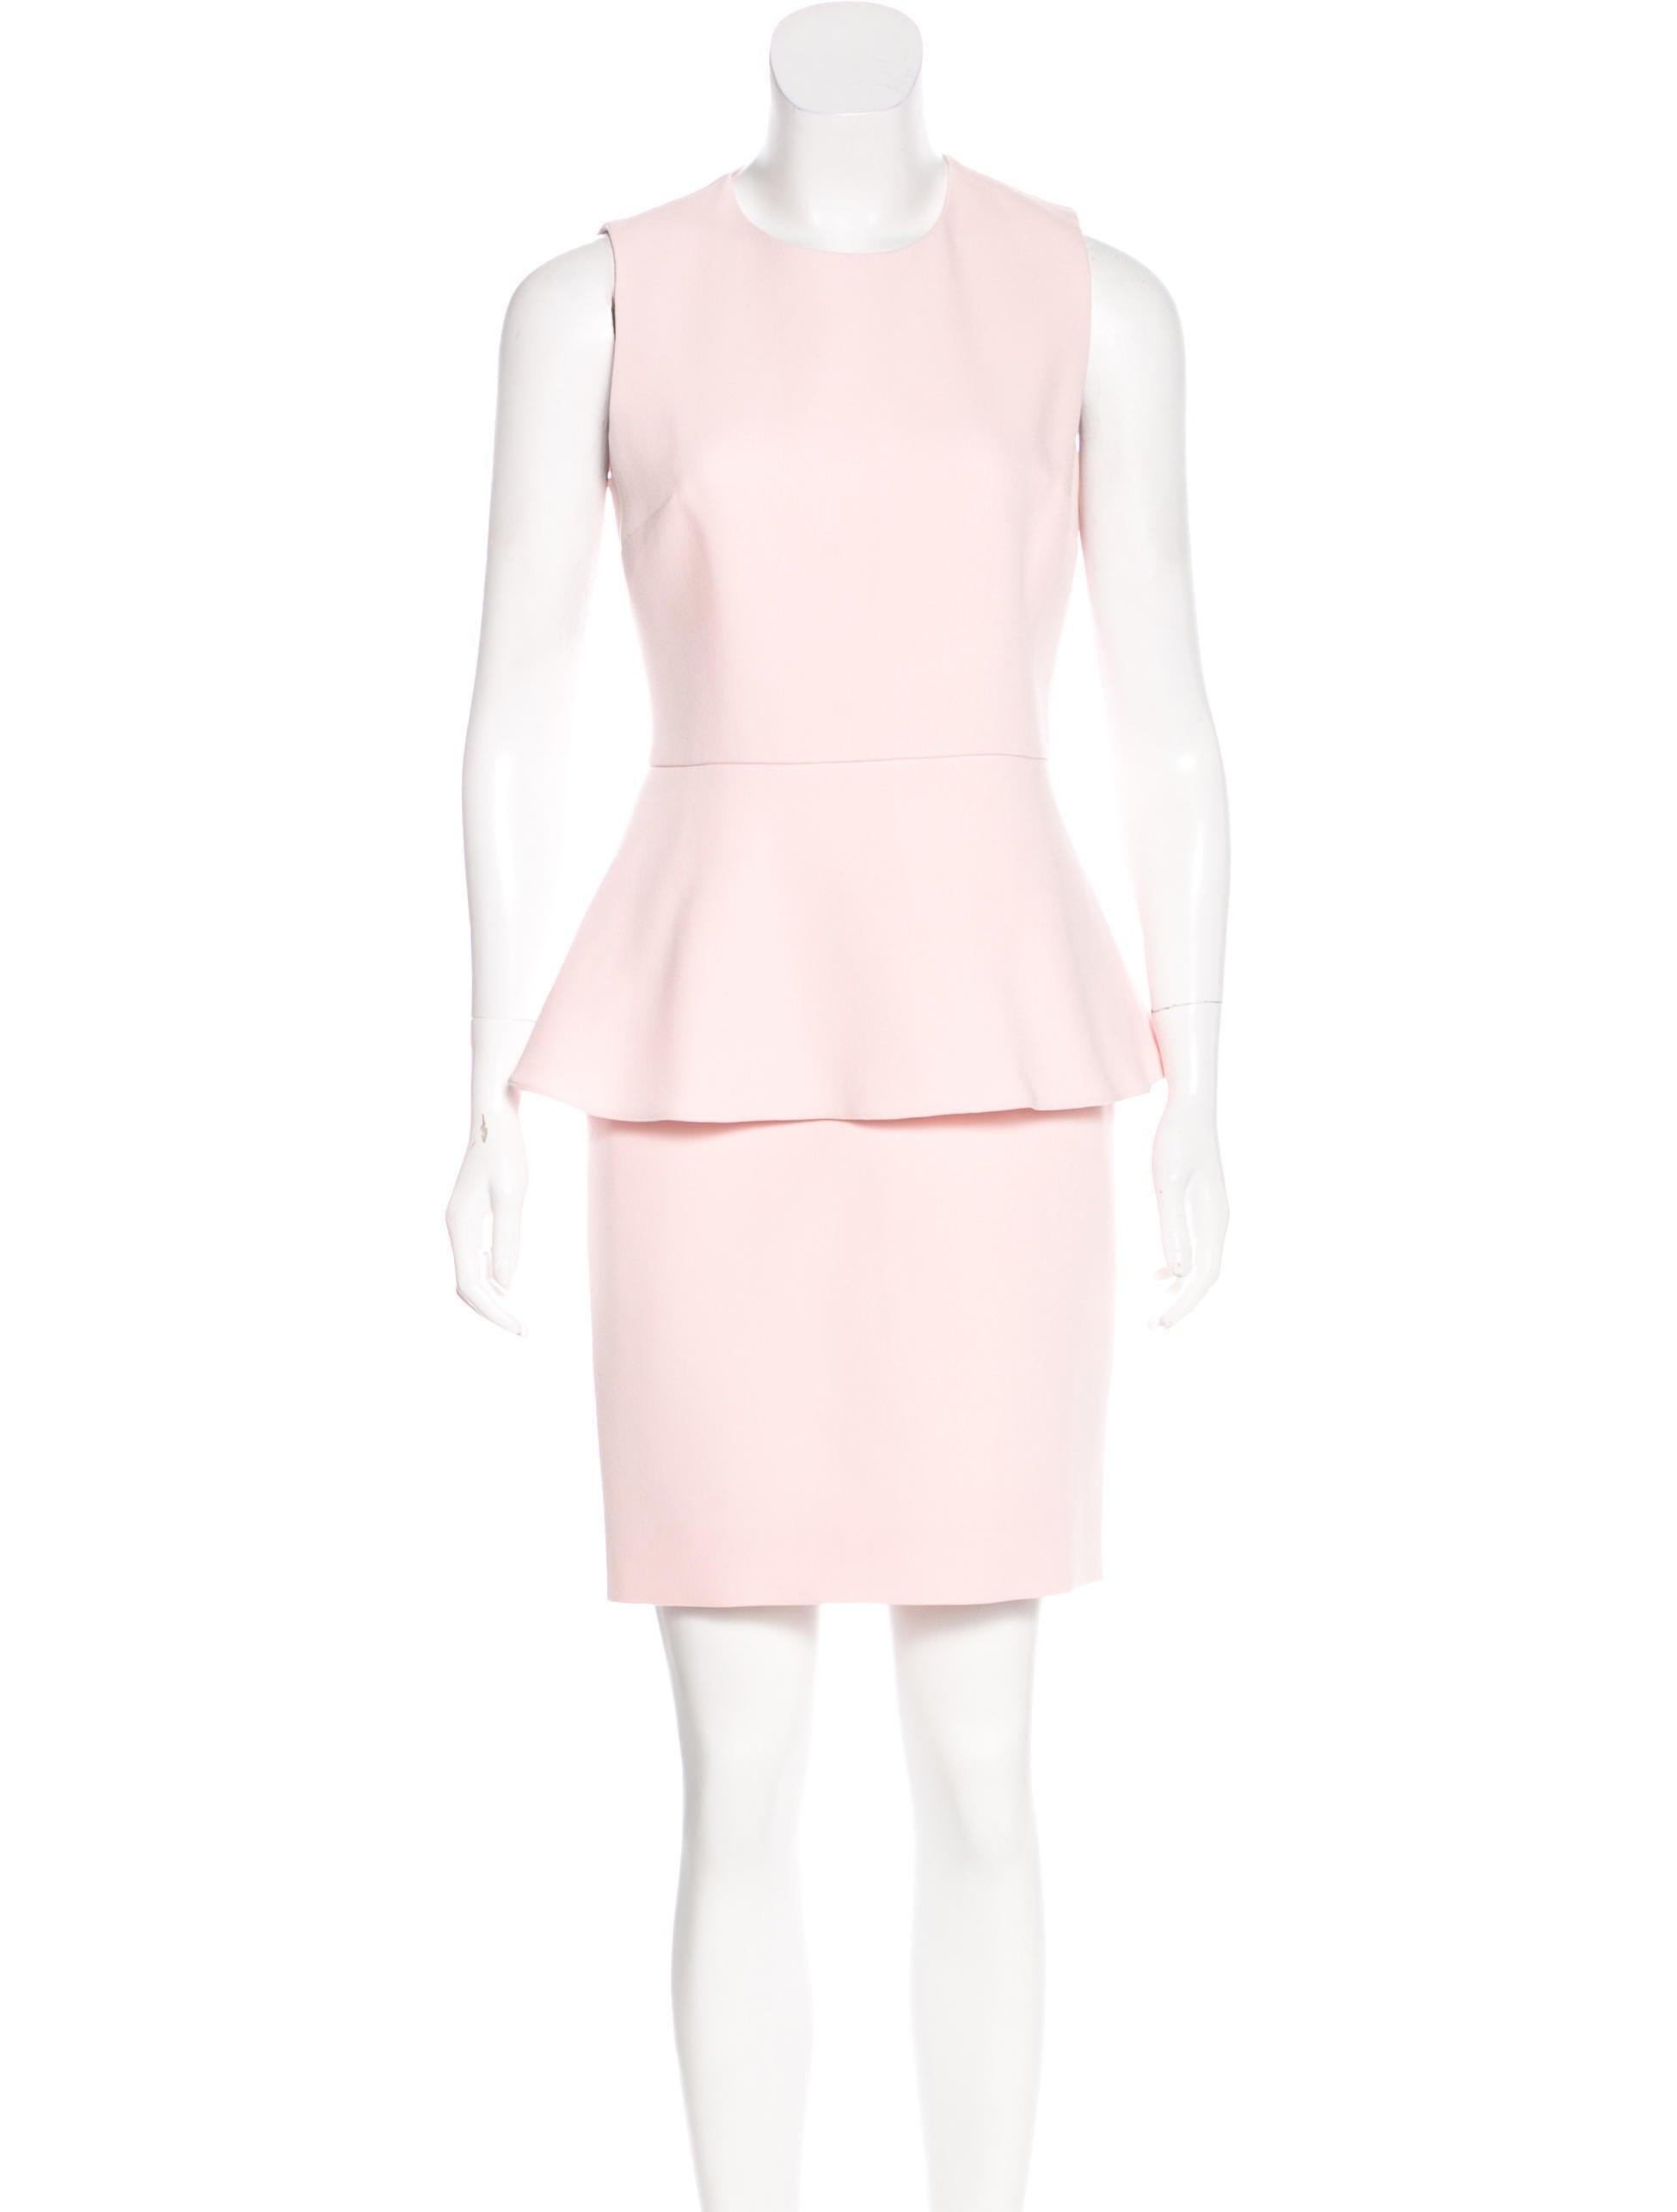 Clearance View Christian Dior Wool Mini Dress Cheap Sale Release Dates Cheap Sale Deals 2018 Online QfqtDB